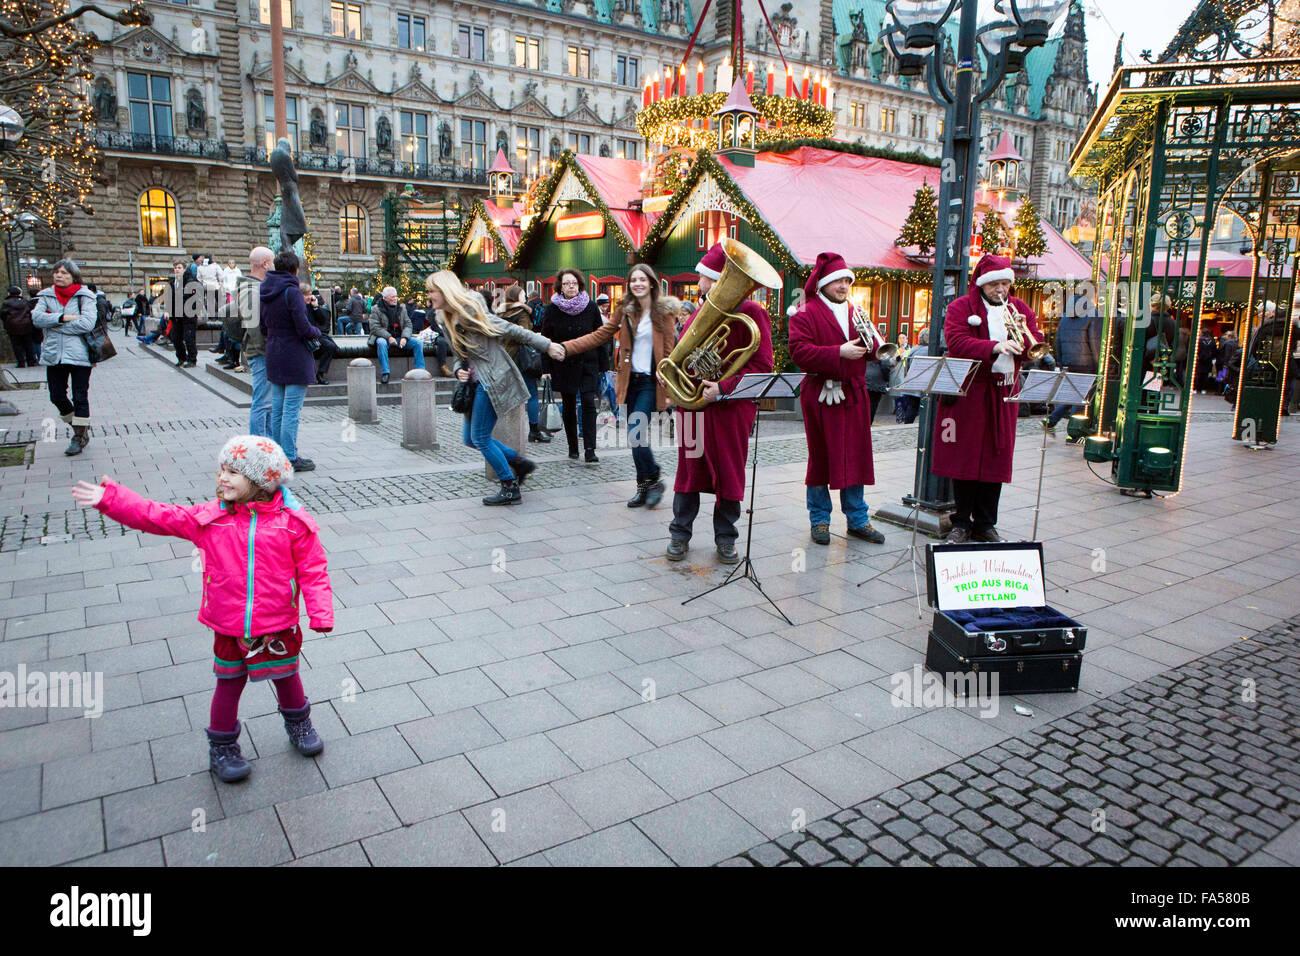 Hamburg Christmas markets at Rathausmarkt - Stock Image